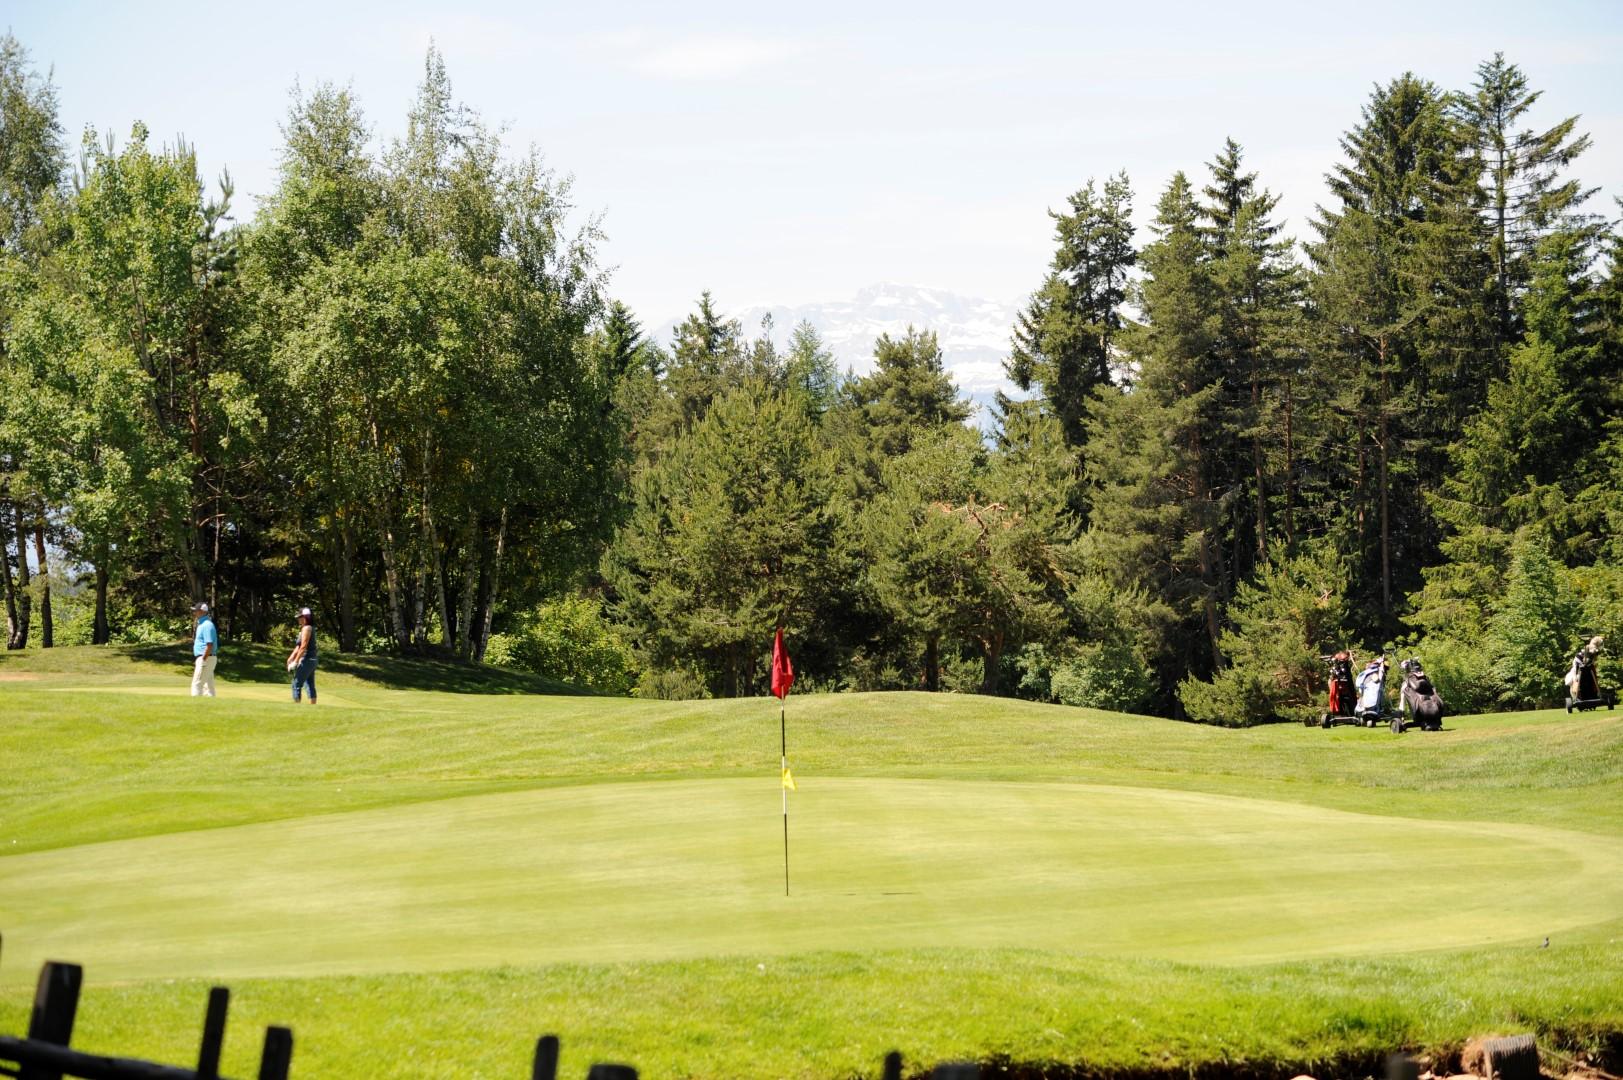 DSC2601 Large - Golfschule